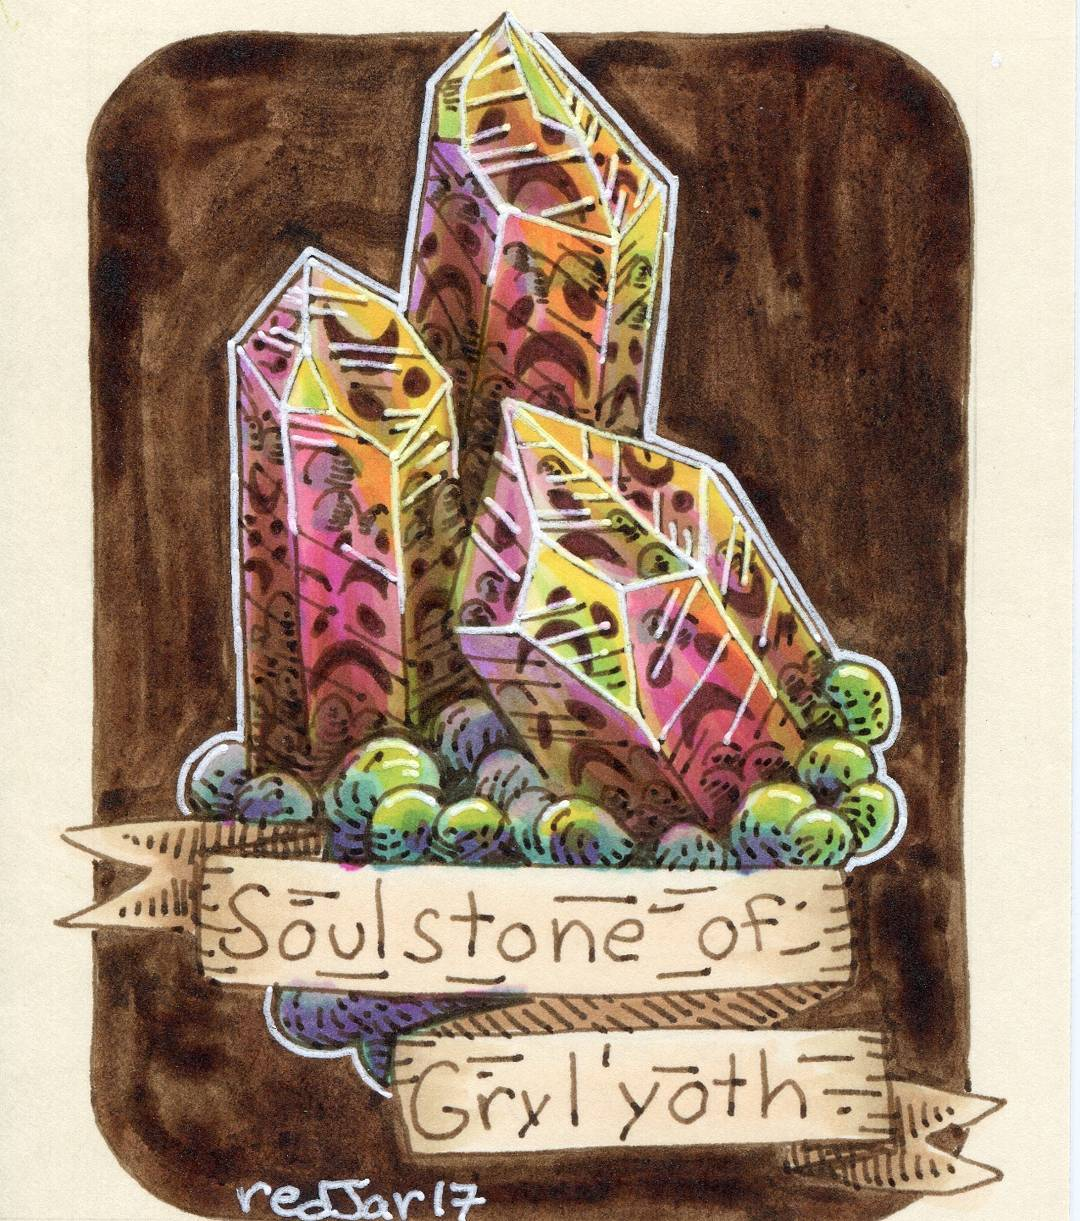 "redjarojam ""Soulstone of Gryl-yoth"" - by Jared DeCosta (redjarojam) www.instagram.com/redjarojam (2017-03) © dell'autore tutti i diritti riservati"